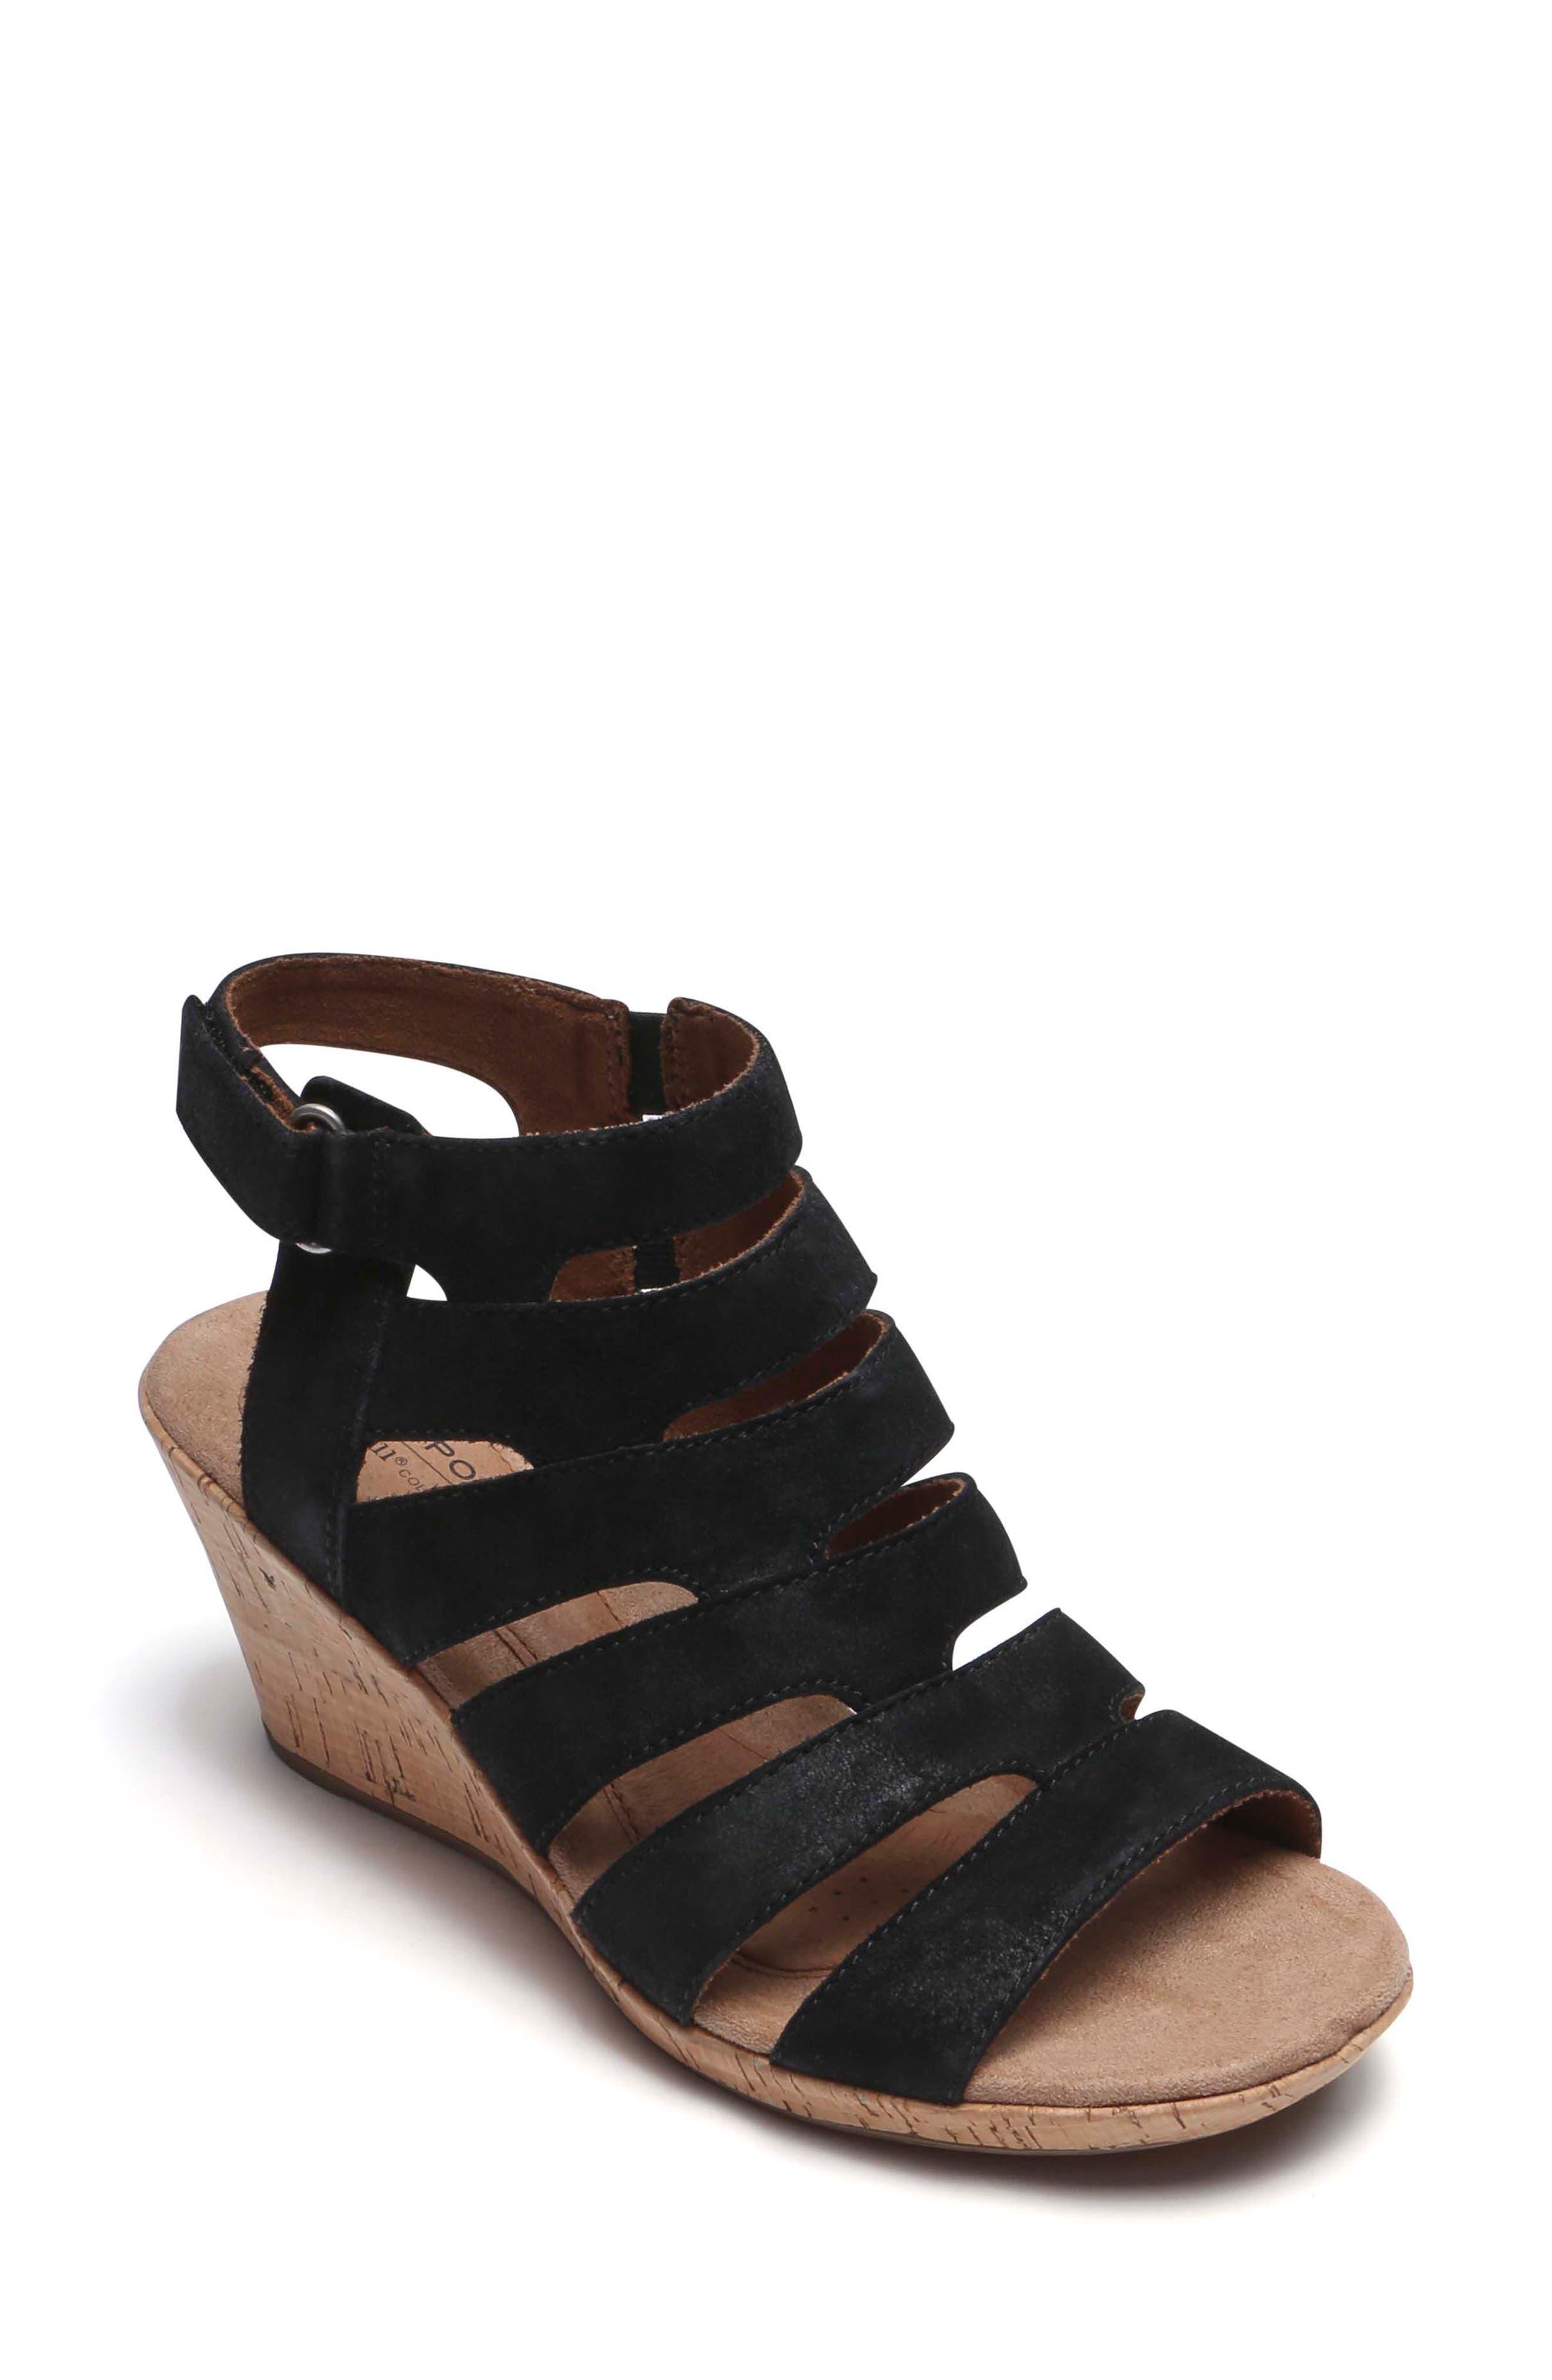 Janna Asymmetrical Sandal,                             Main thumbnail 1, color,                             001